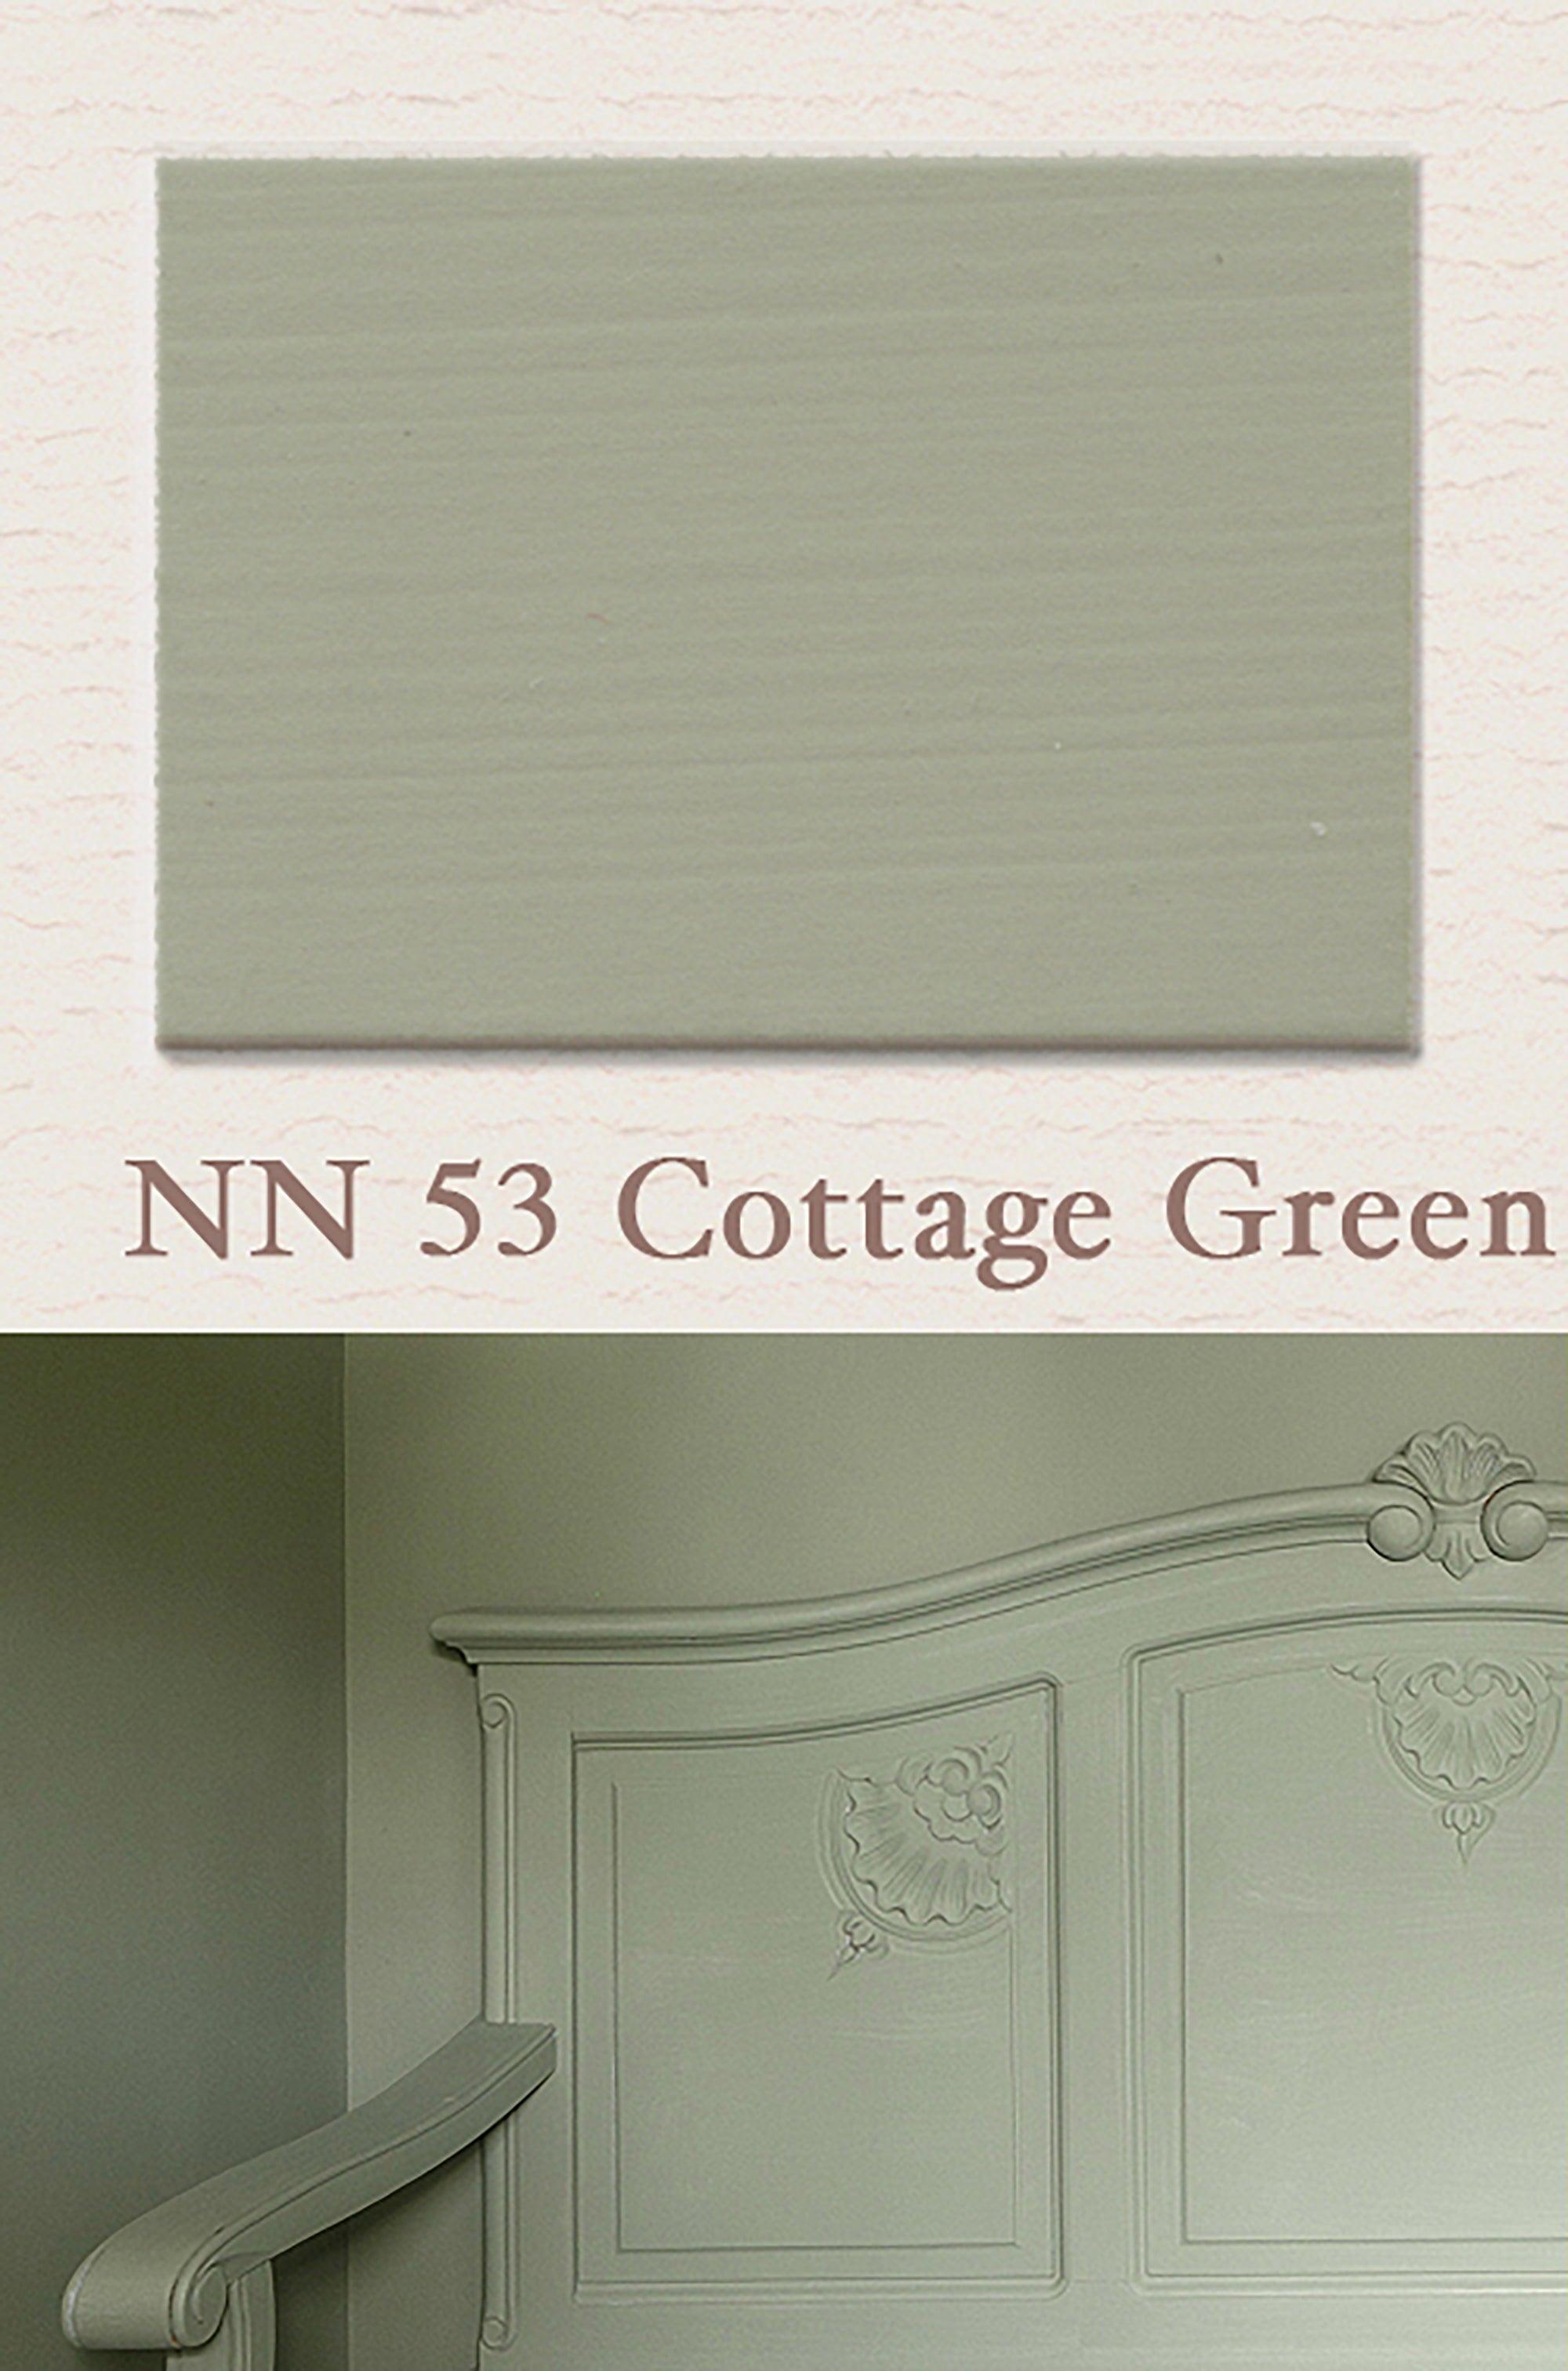 Cottage Green